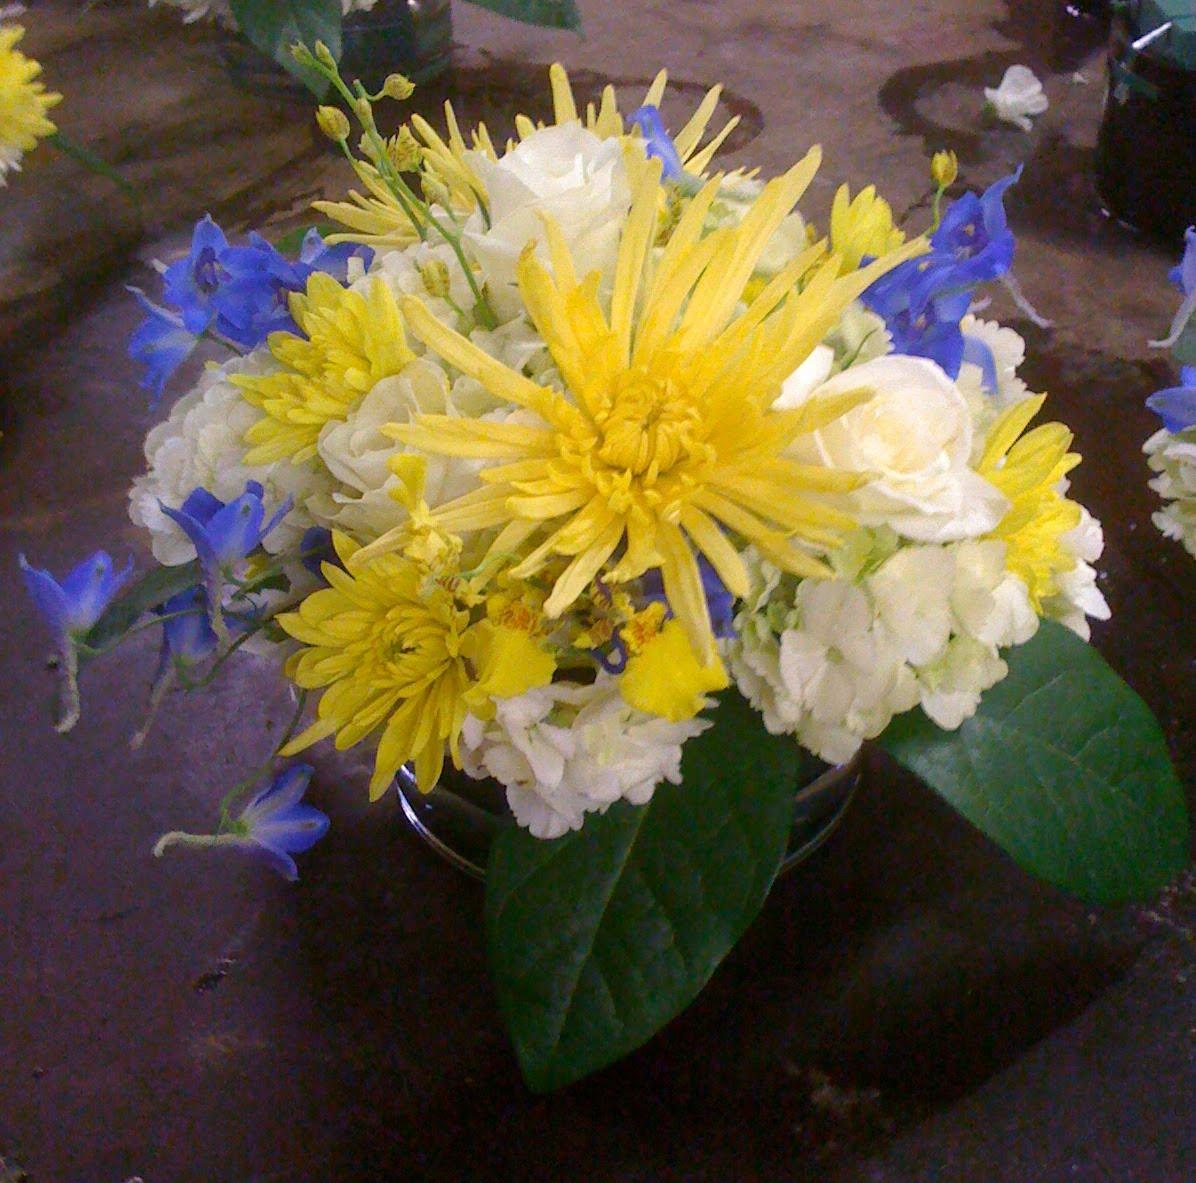 Amies blog royal blue wedding decorations royal blue yellow and white mightylinksfo